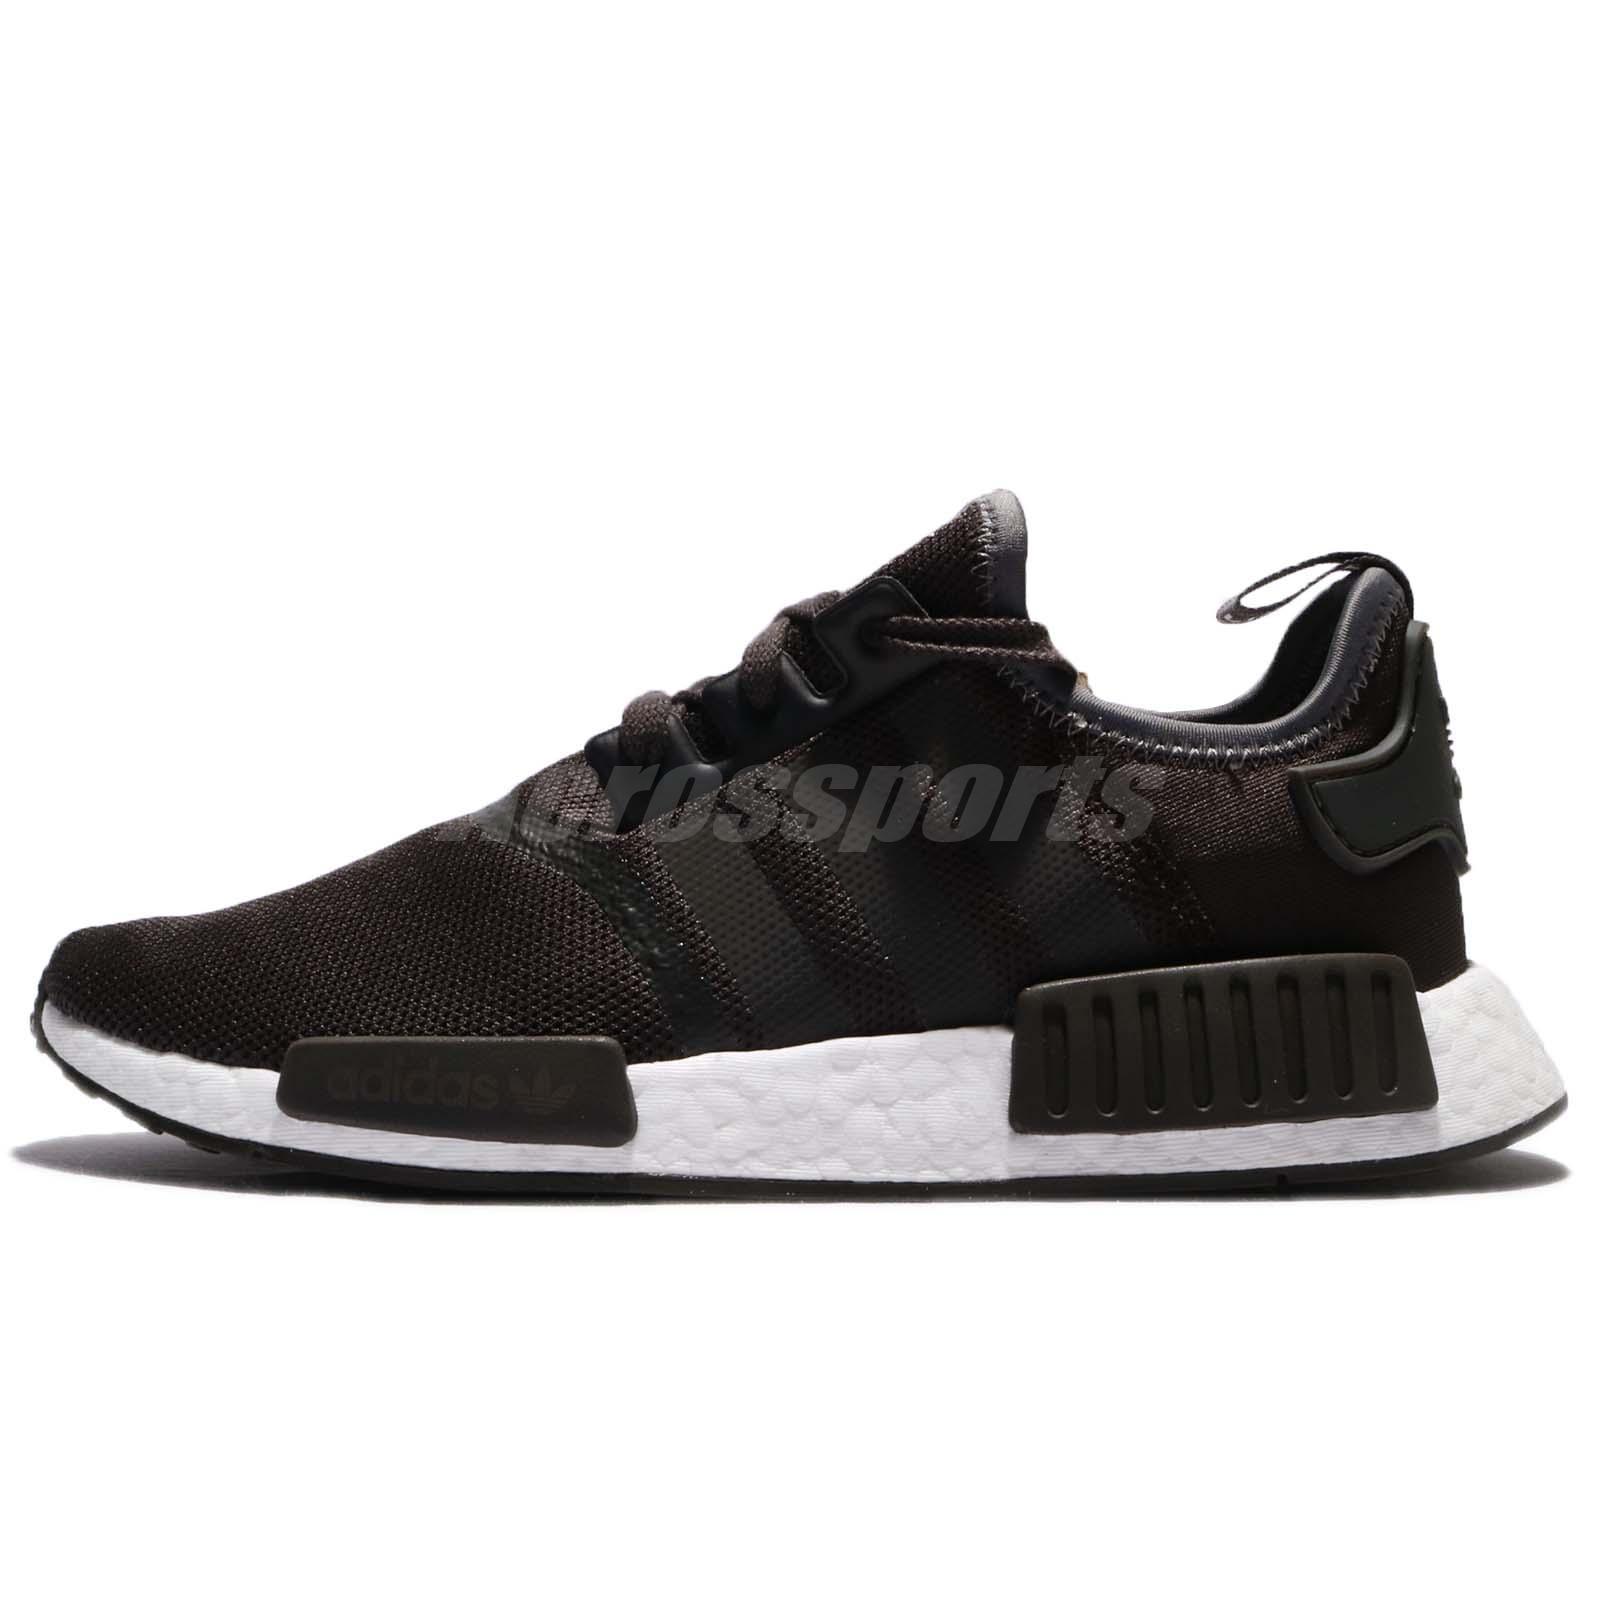 857804e14e918 adidas Originals NMD R1 Boost Brown Trace Grey Metallic Men Shoes Sneaker  CQ2412